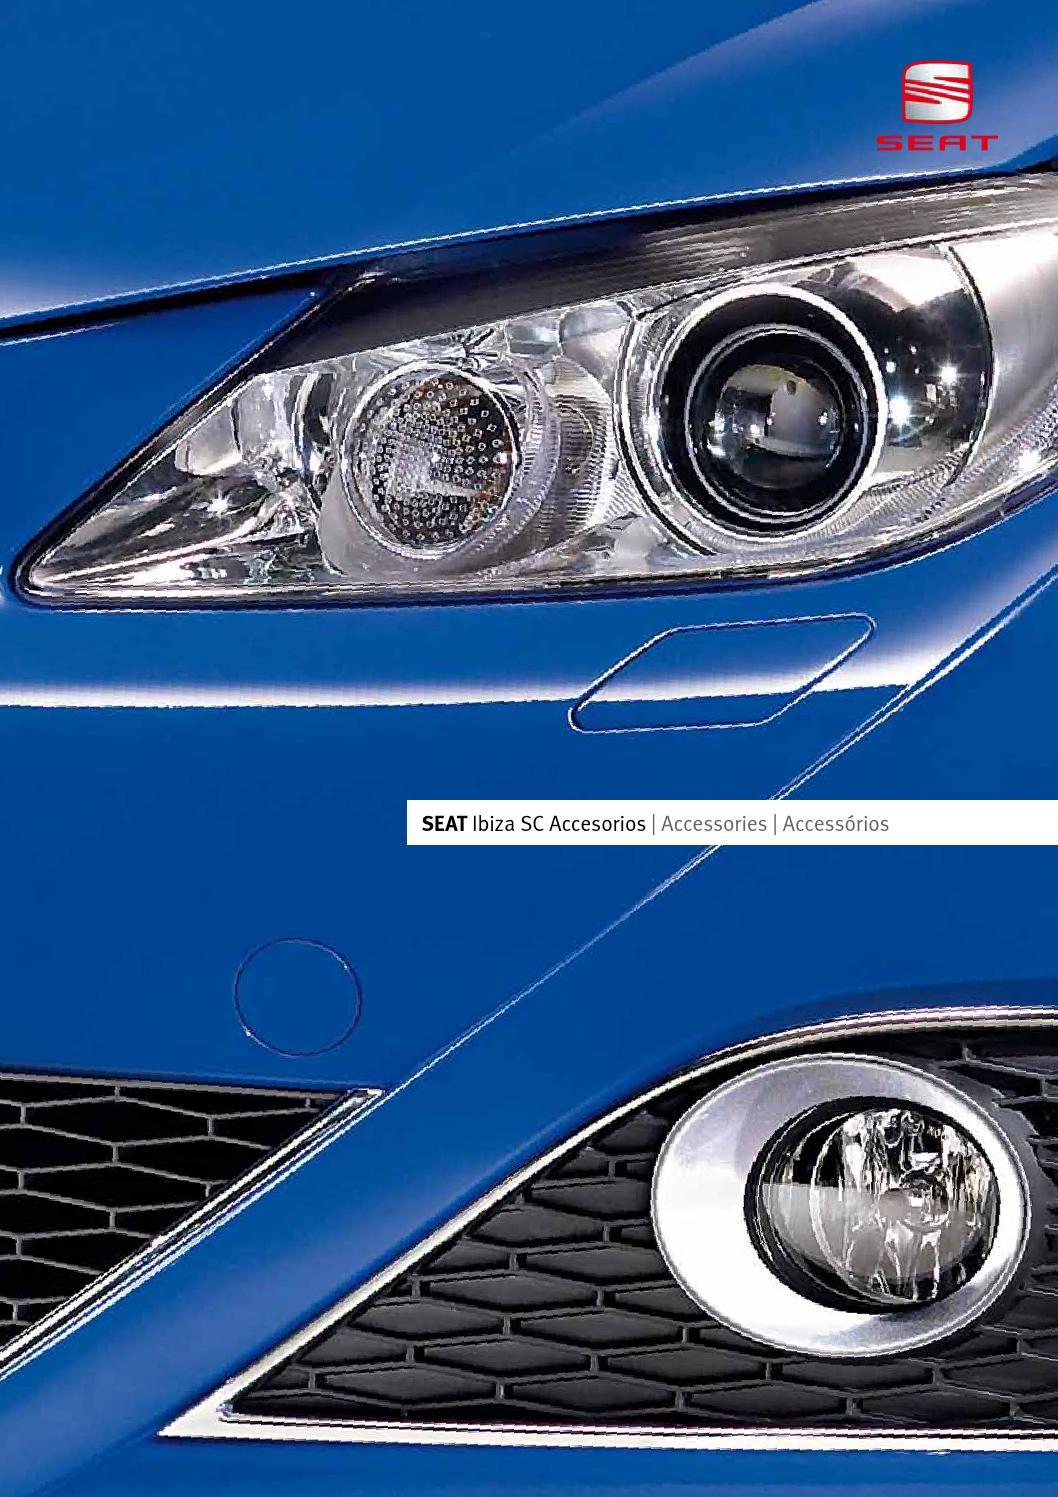 Universal ya referencia ya referencias real fell antracita para los modelos VW